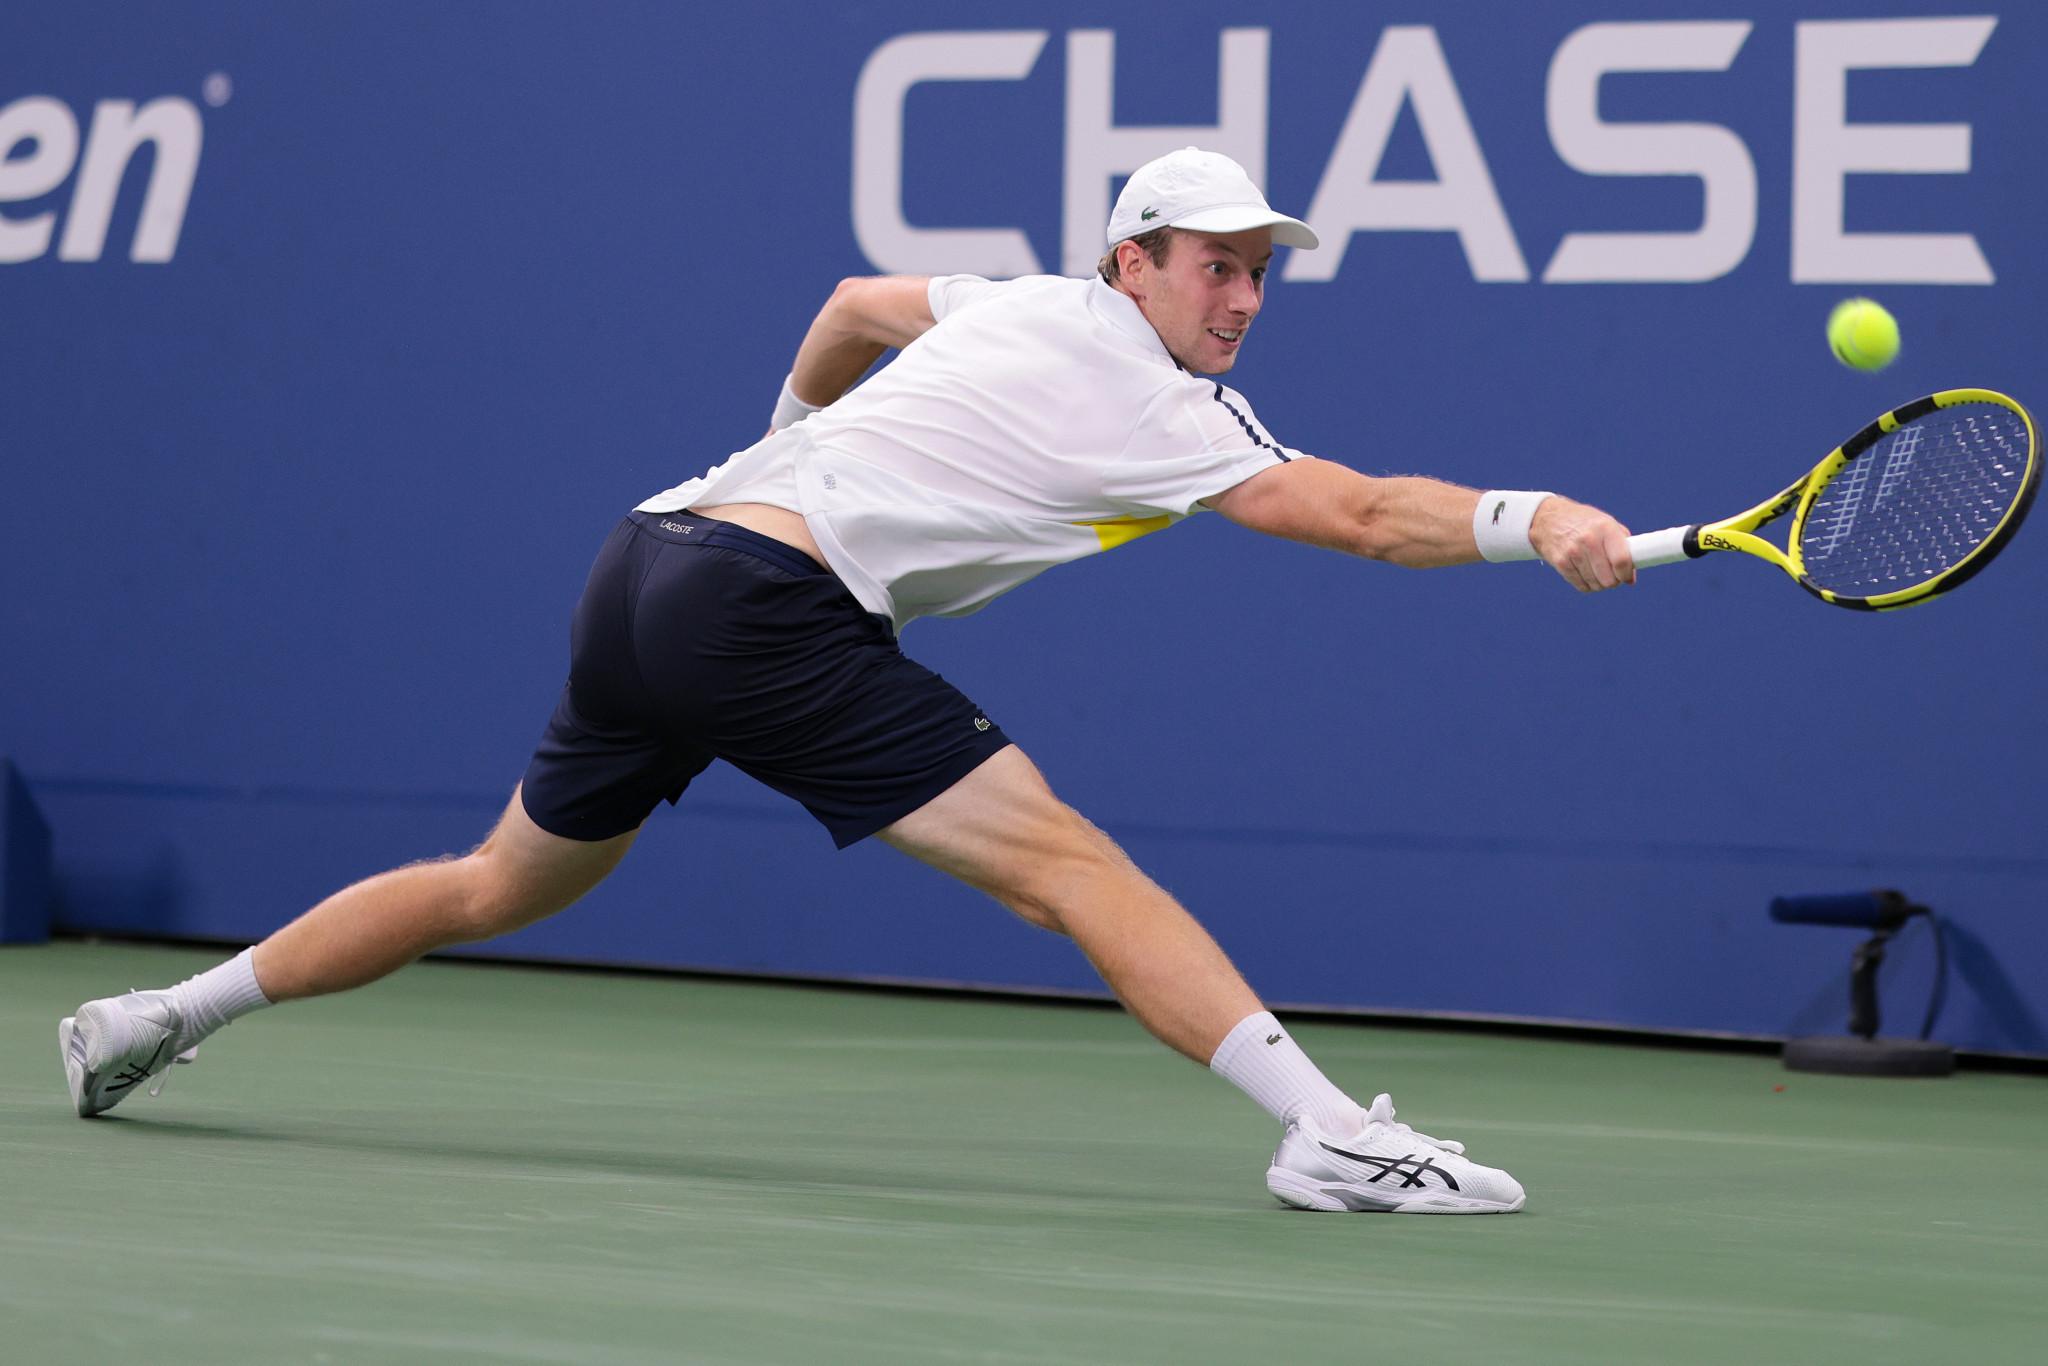 Van De Zandschulp and Fernandez produce stunning upsets in US Open fourth round